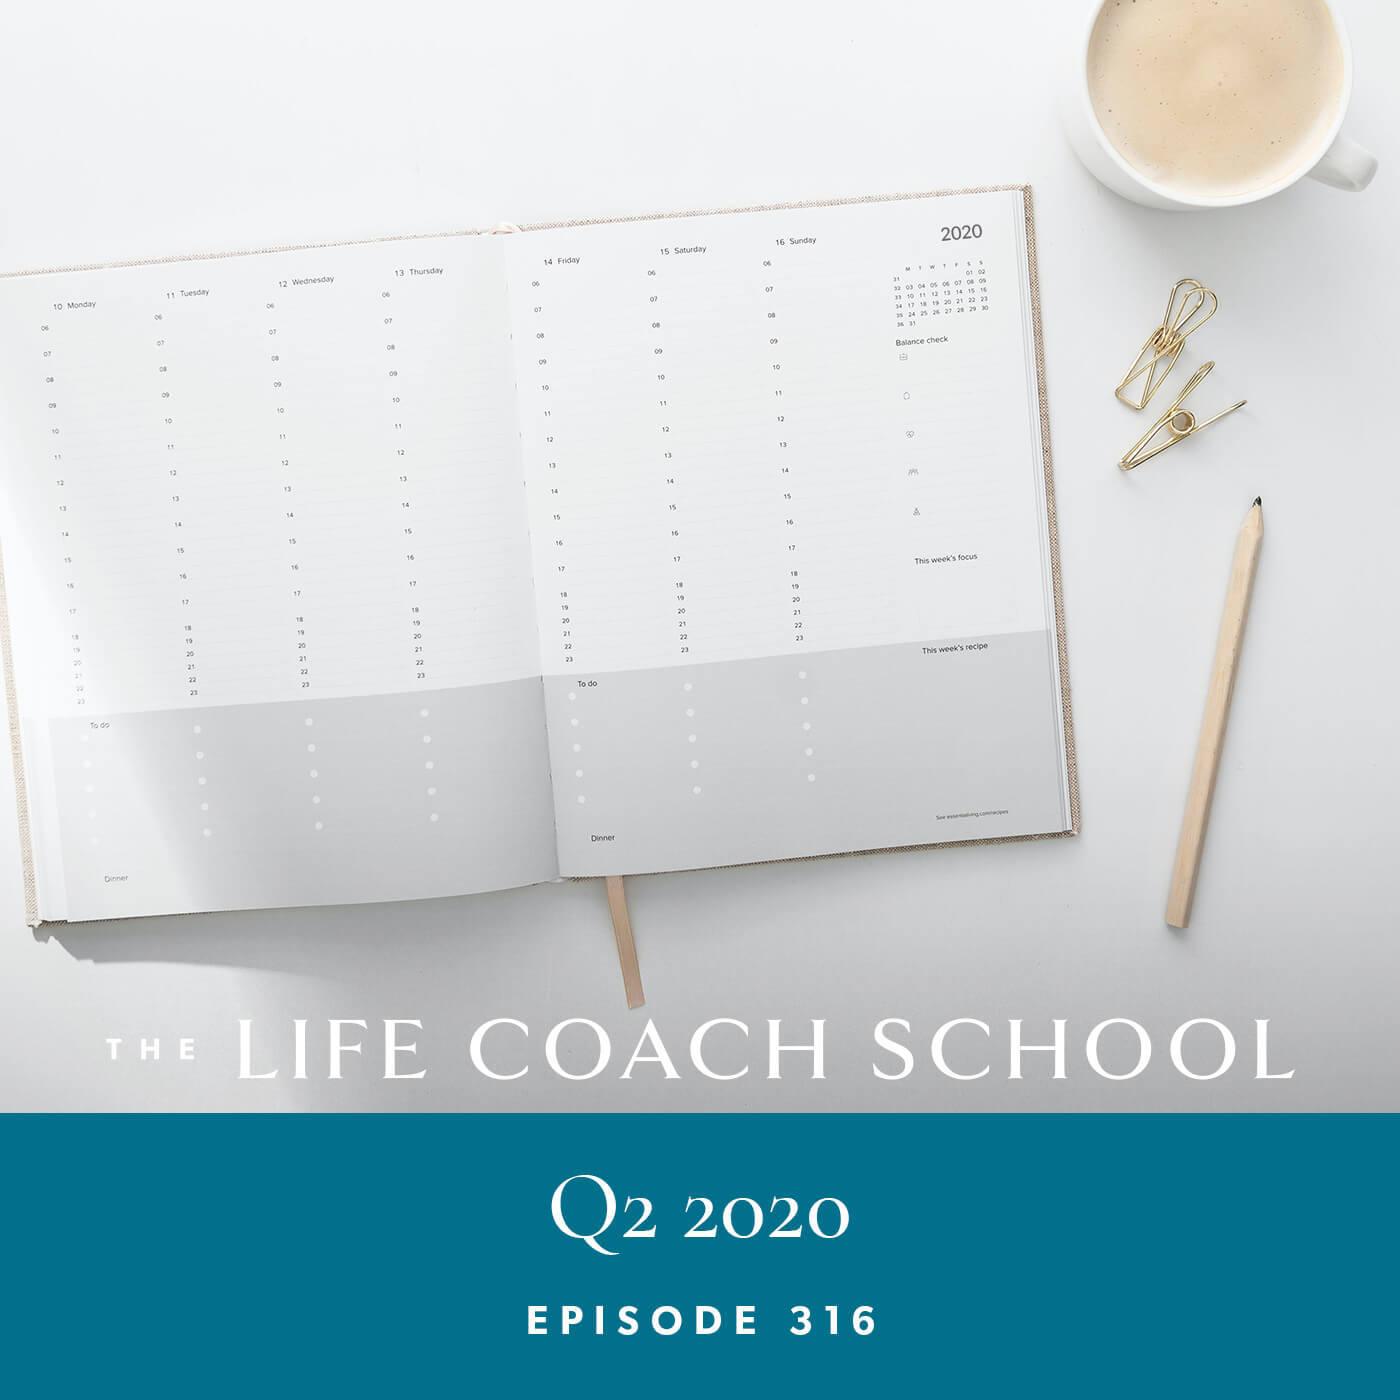 The Life Coach School Podcast with Brooke Castillo | Episode 316 | Q2 2020